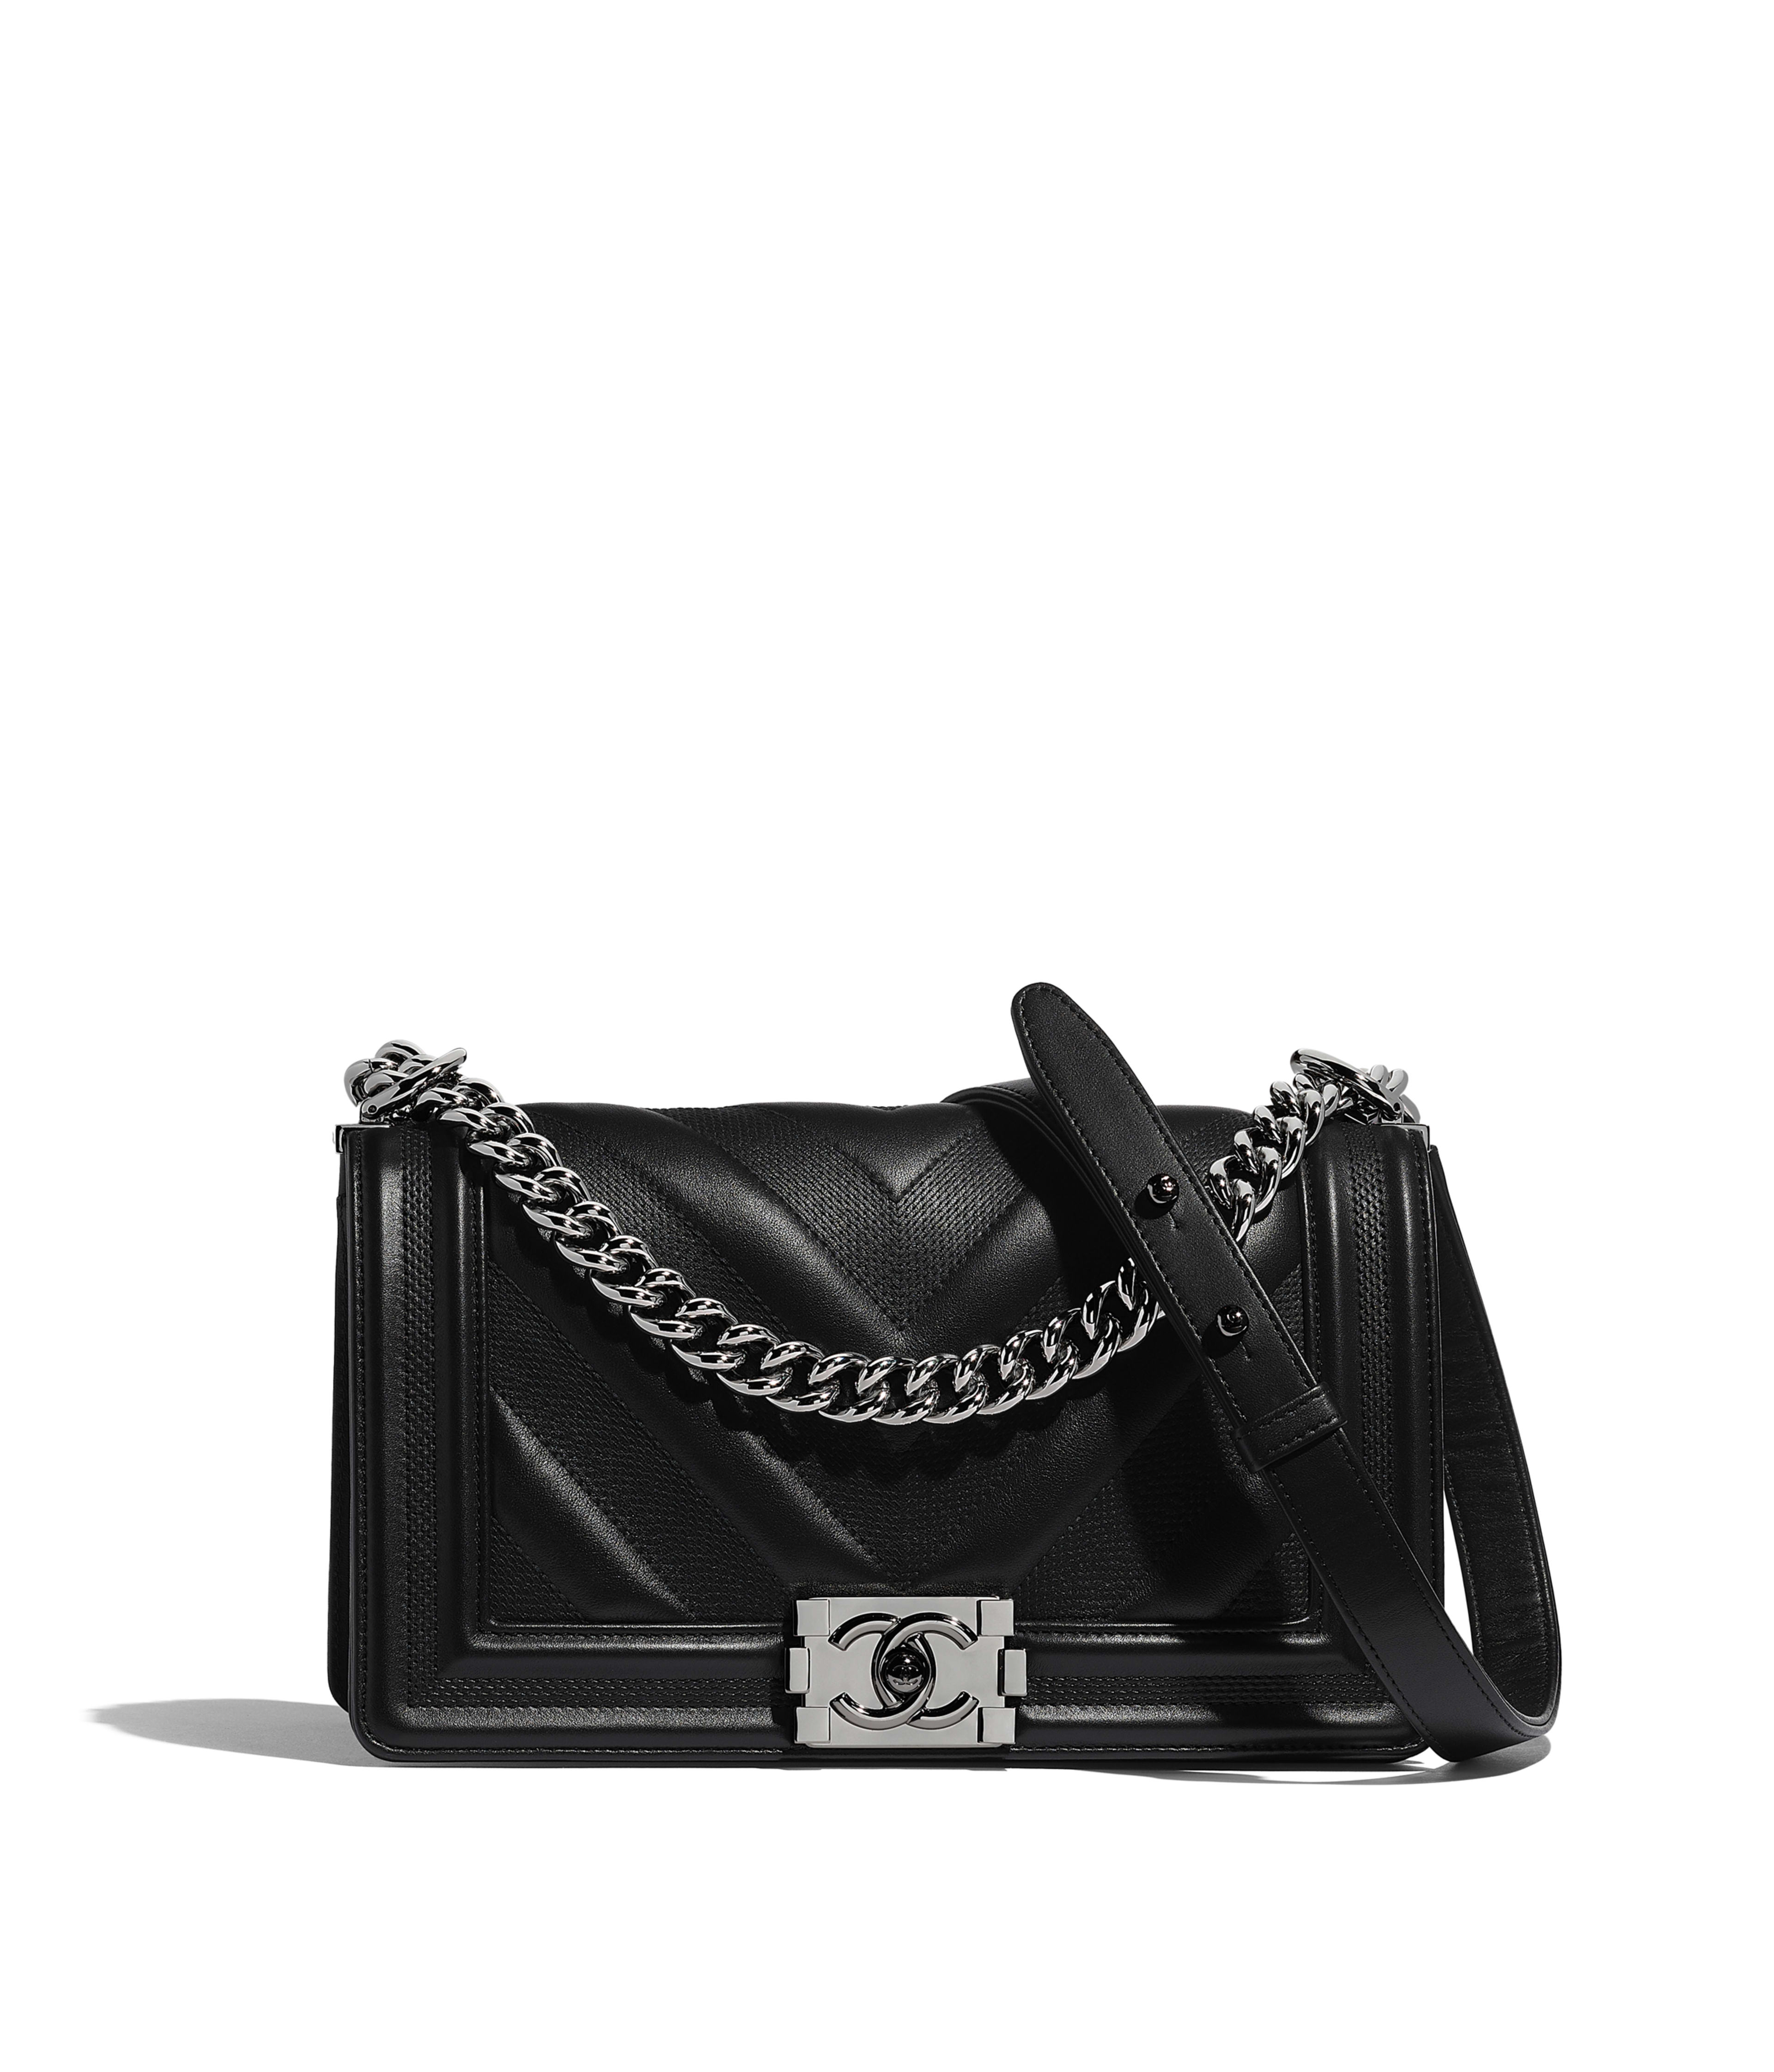 fd3a161767 Handbags - Fashion | CHANEL